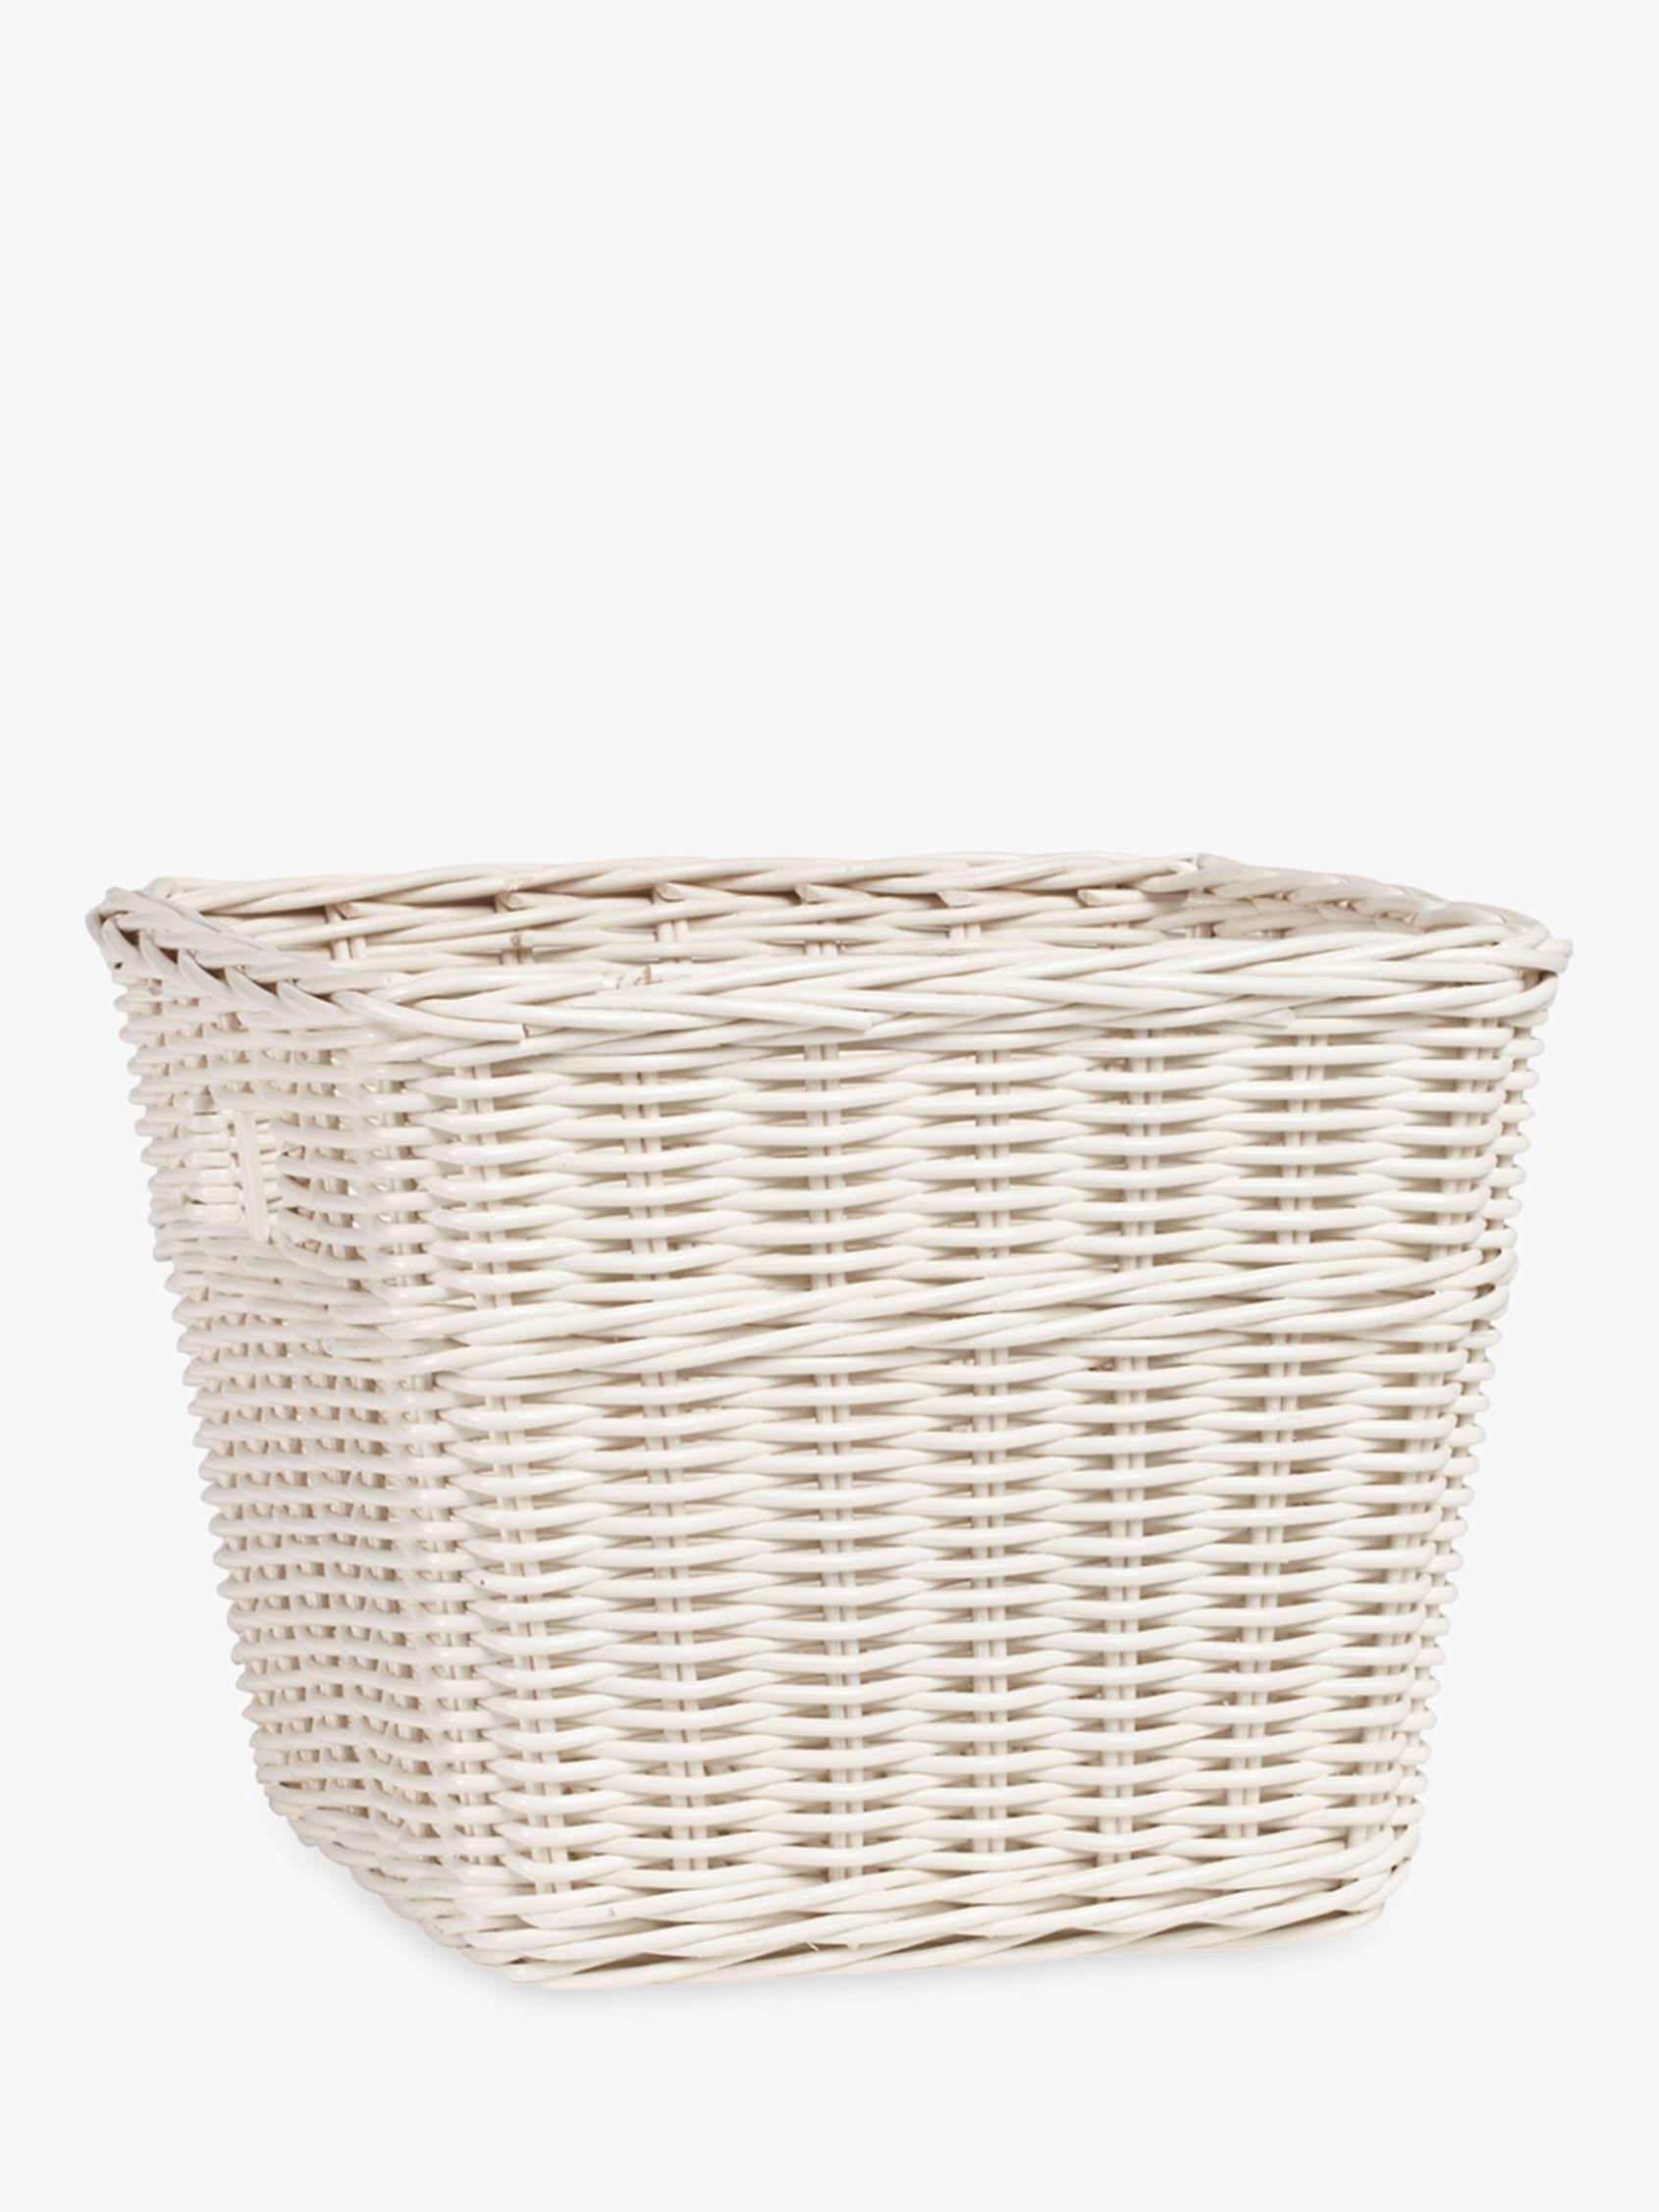 Pottery Barn Kids Sabrina Large Storage Basket, White